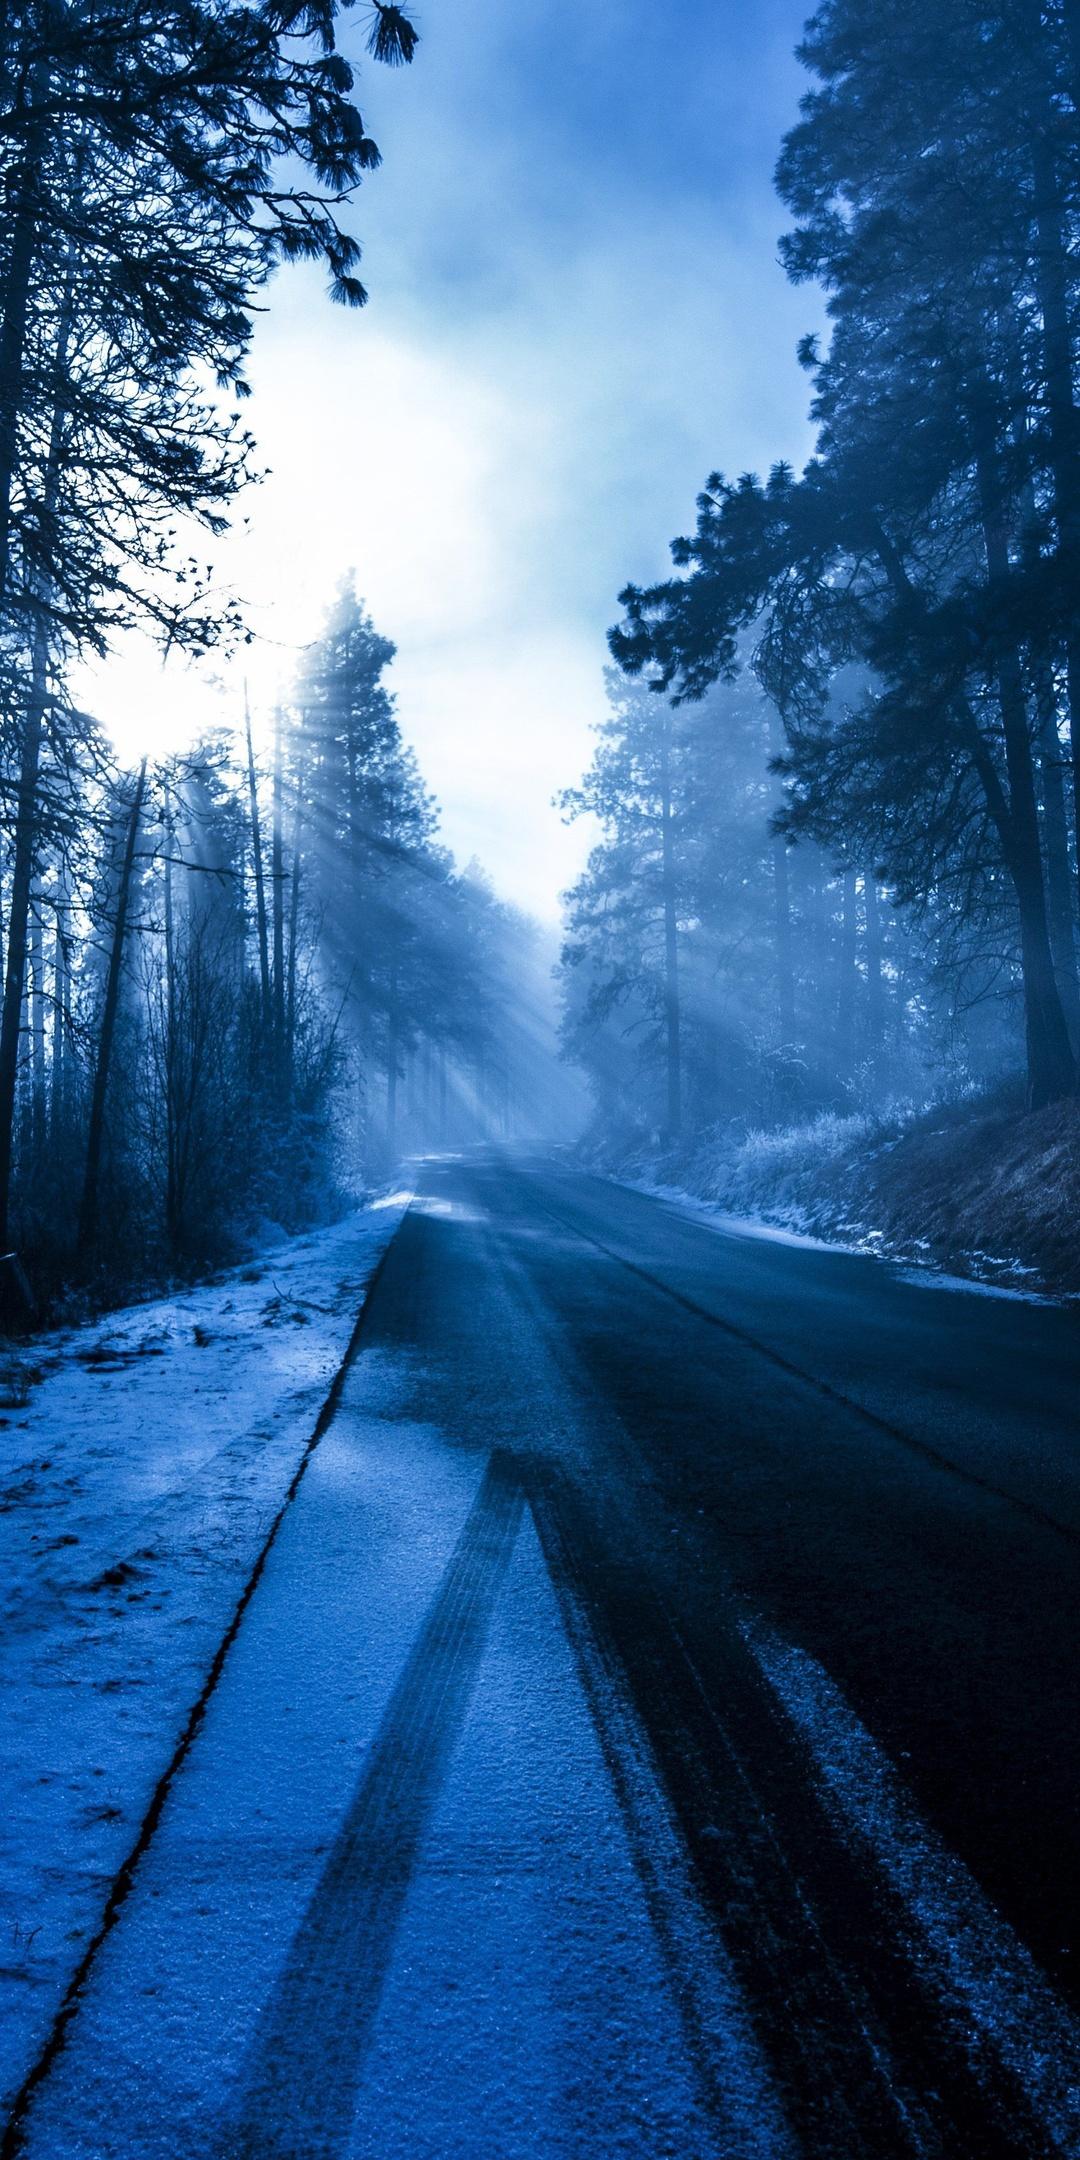 winter-road-nature-5k-2w.jpg